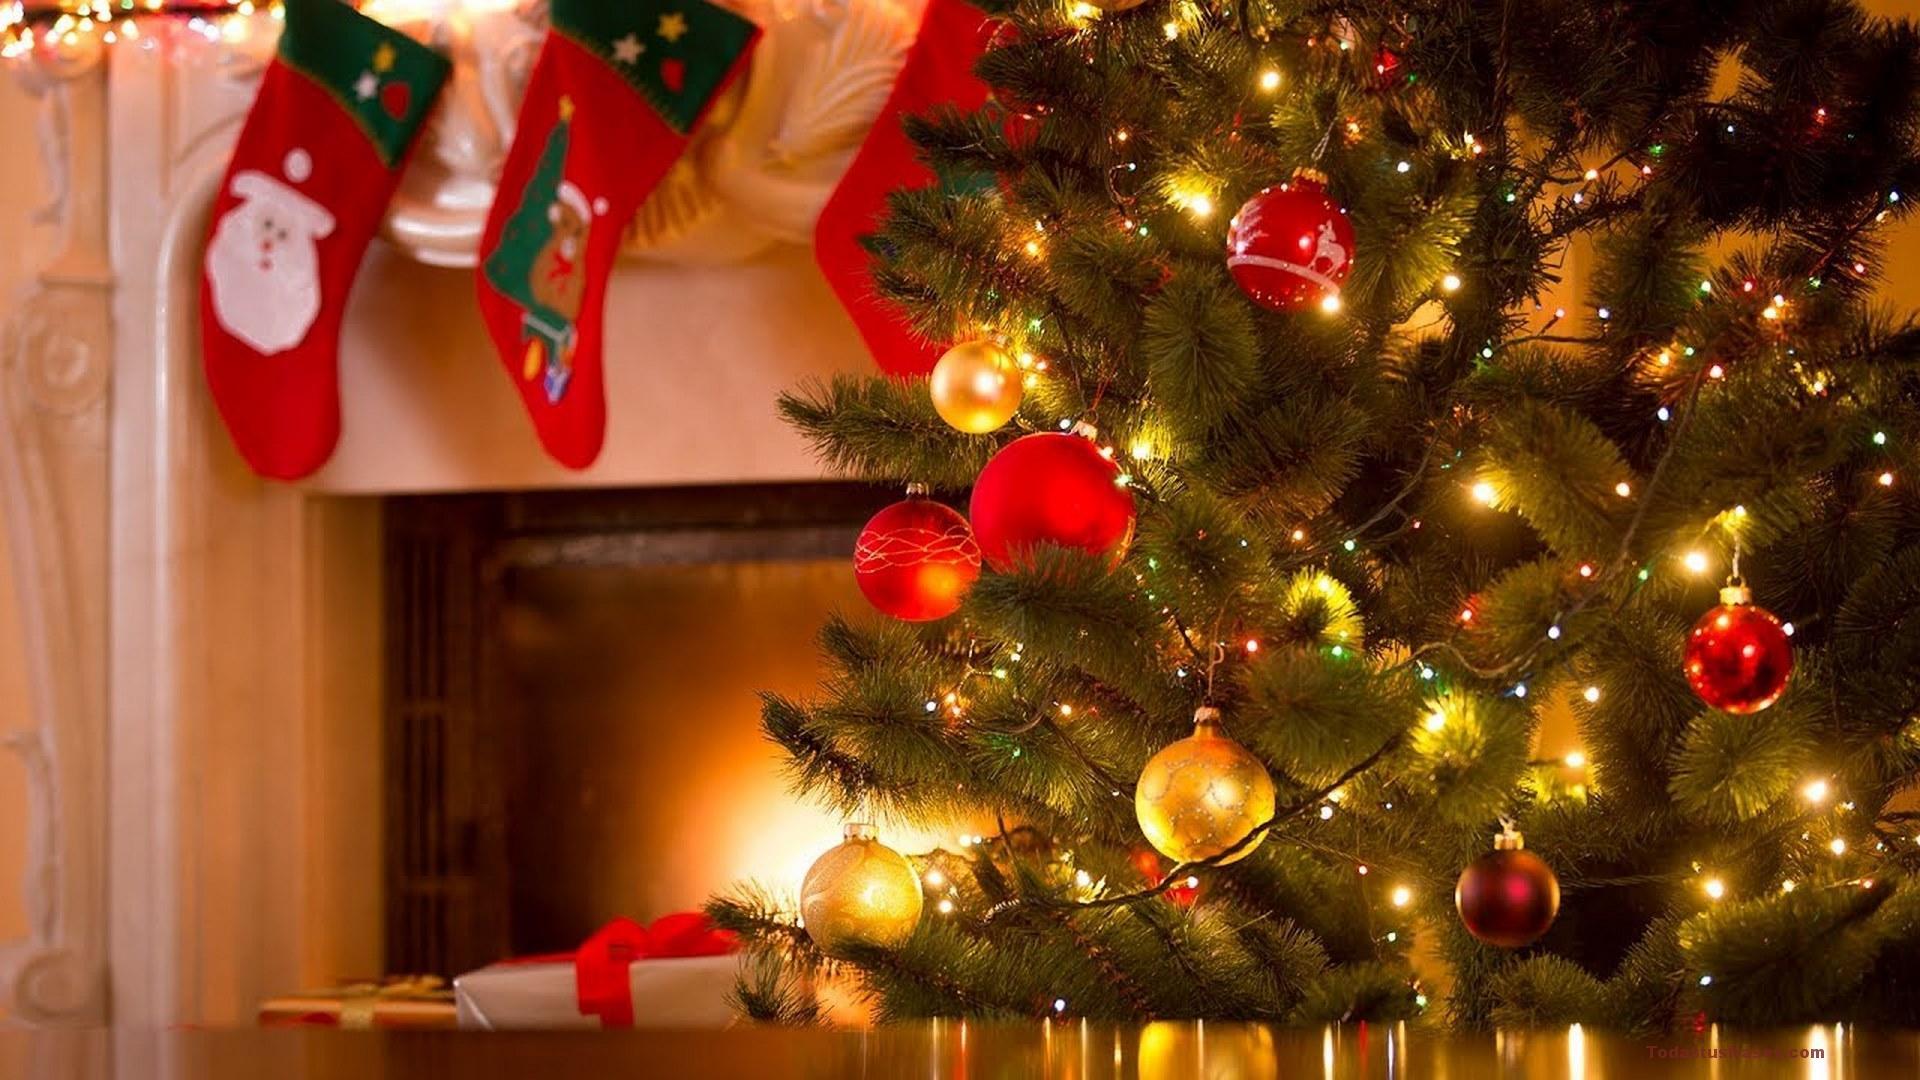 Fondos de pantalla de navidad todas tus frases for Pc in regalo gratis